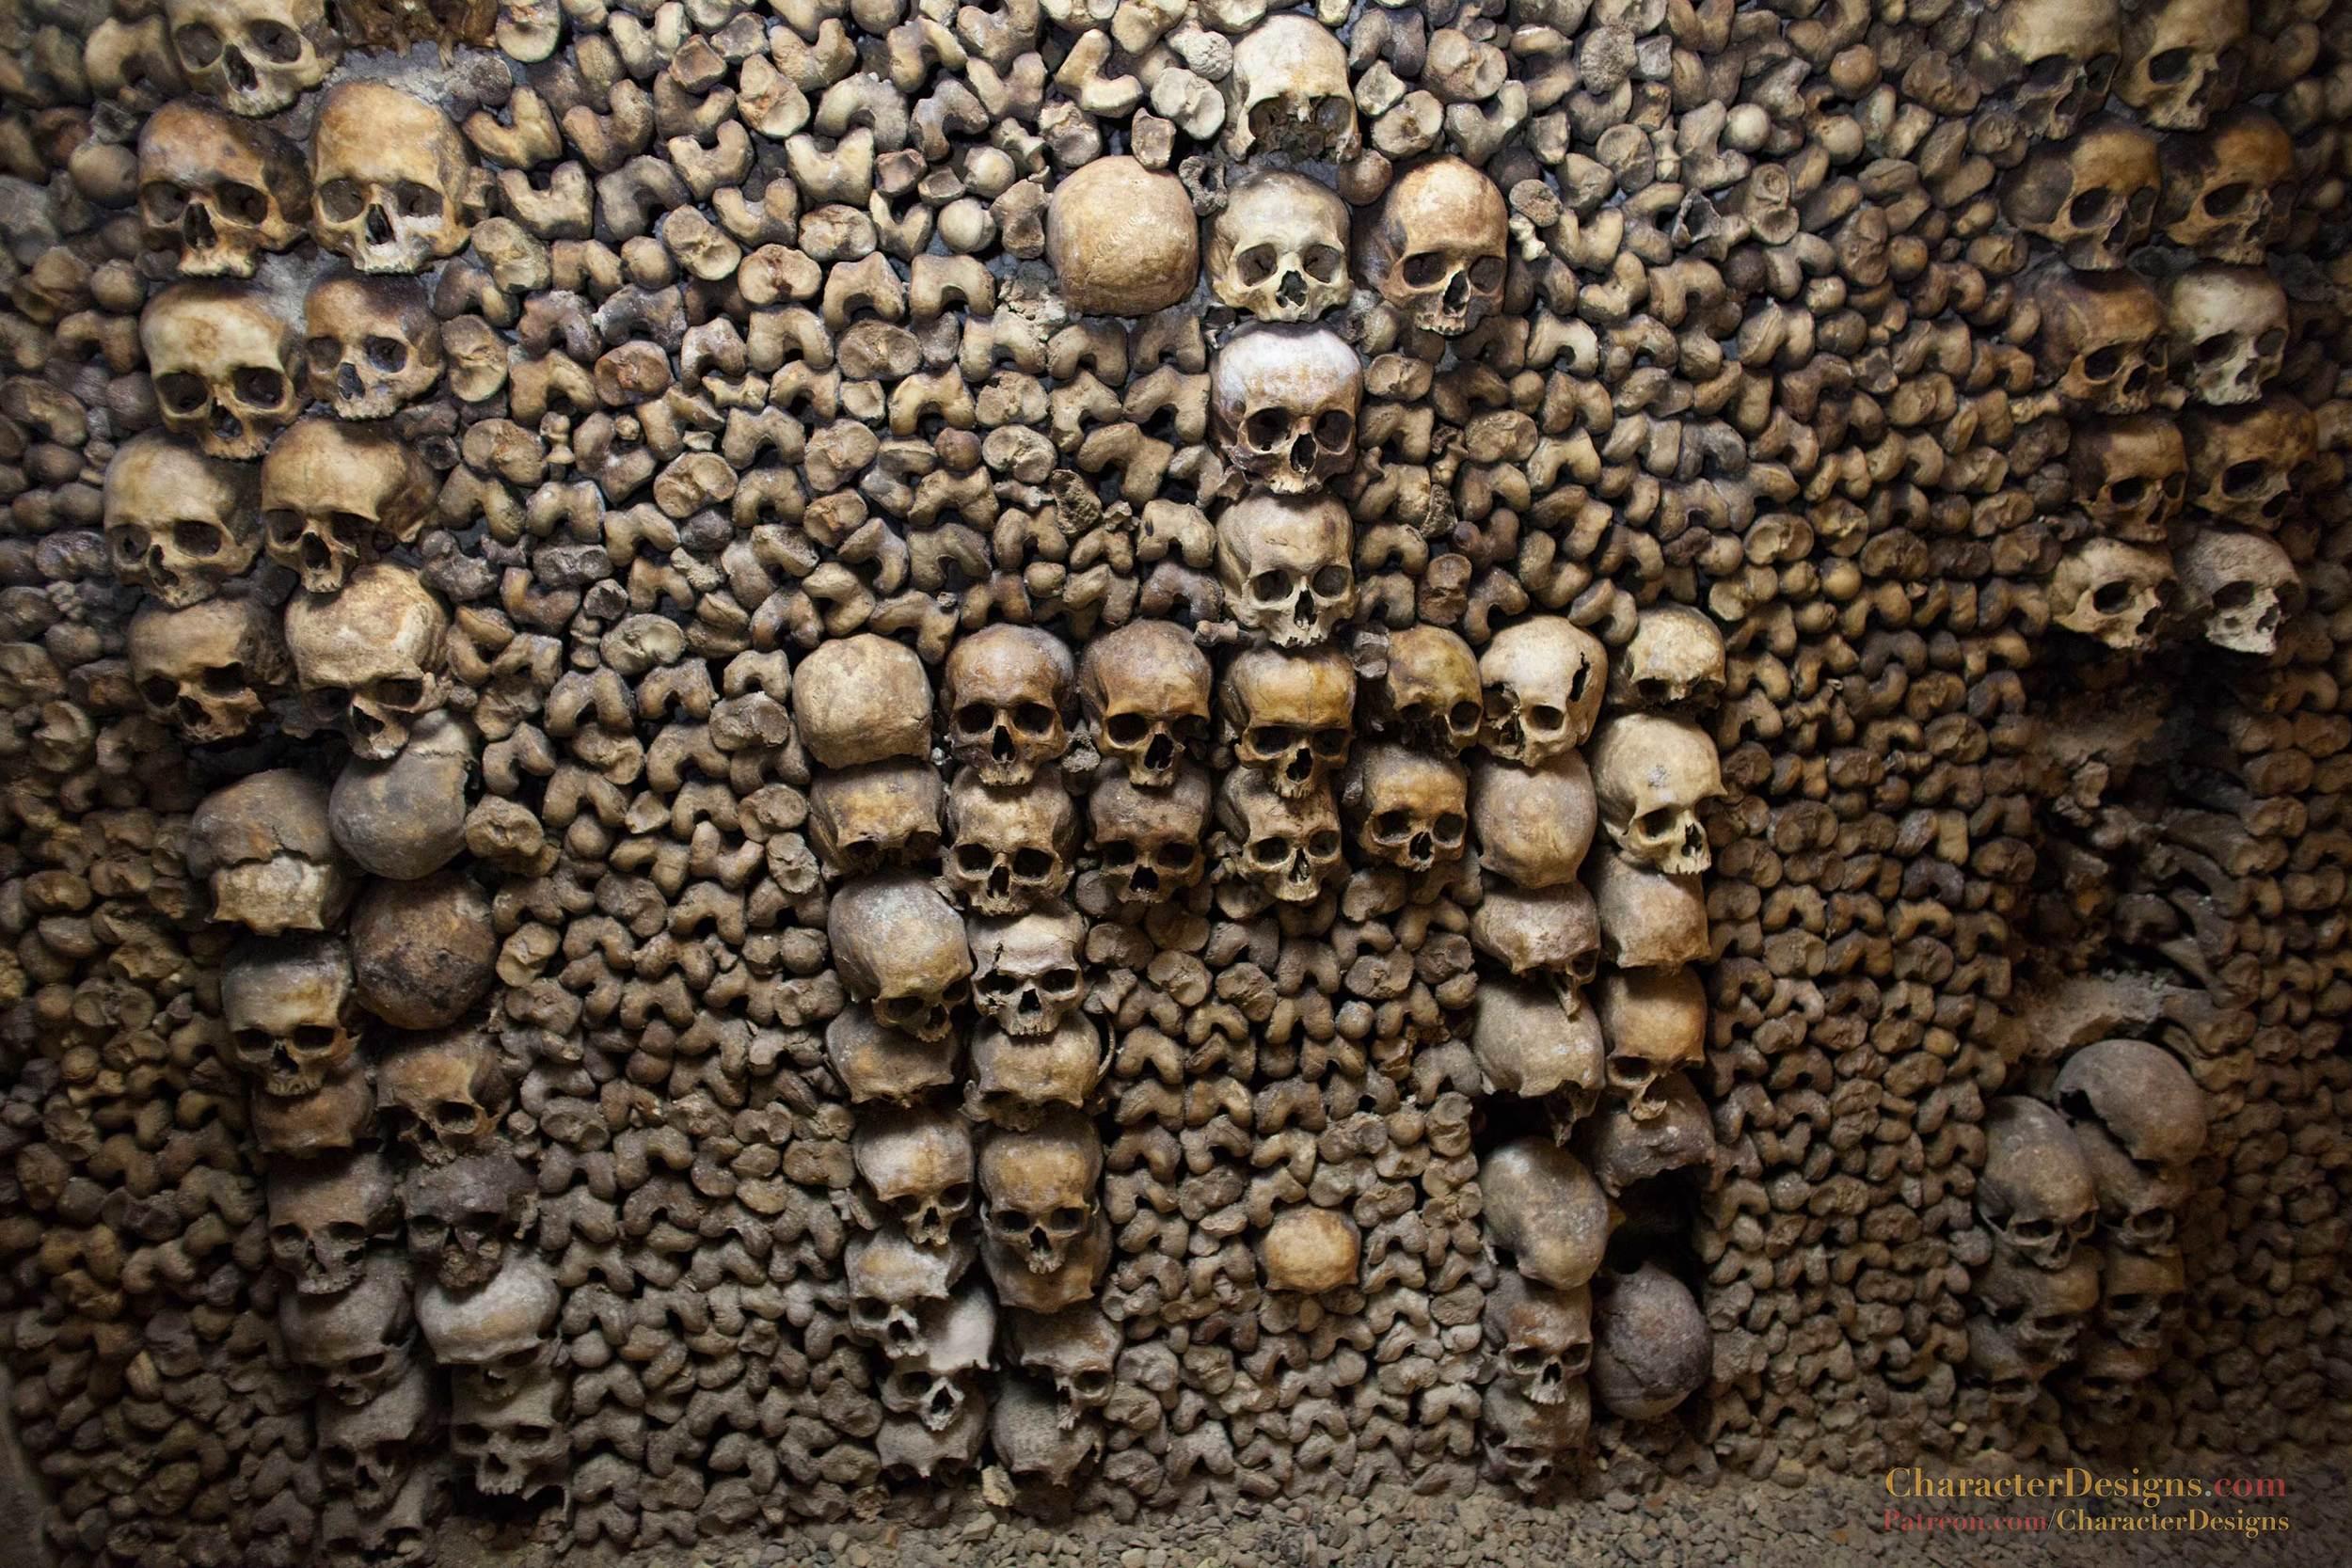 Catacombs_092.jpg